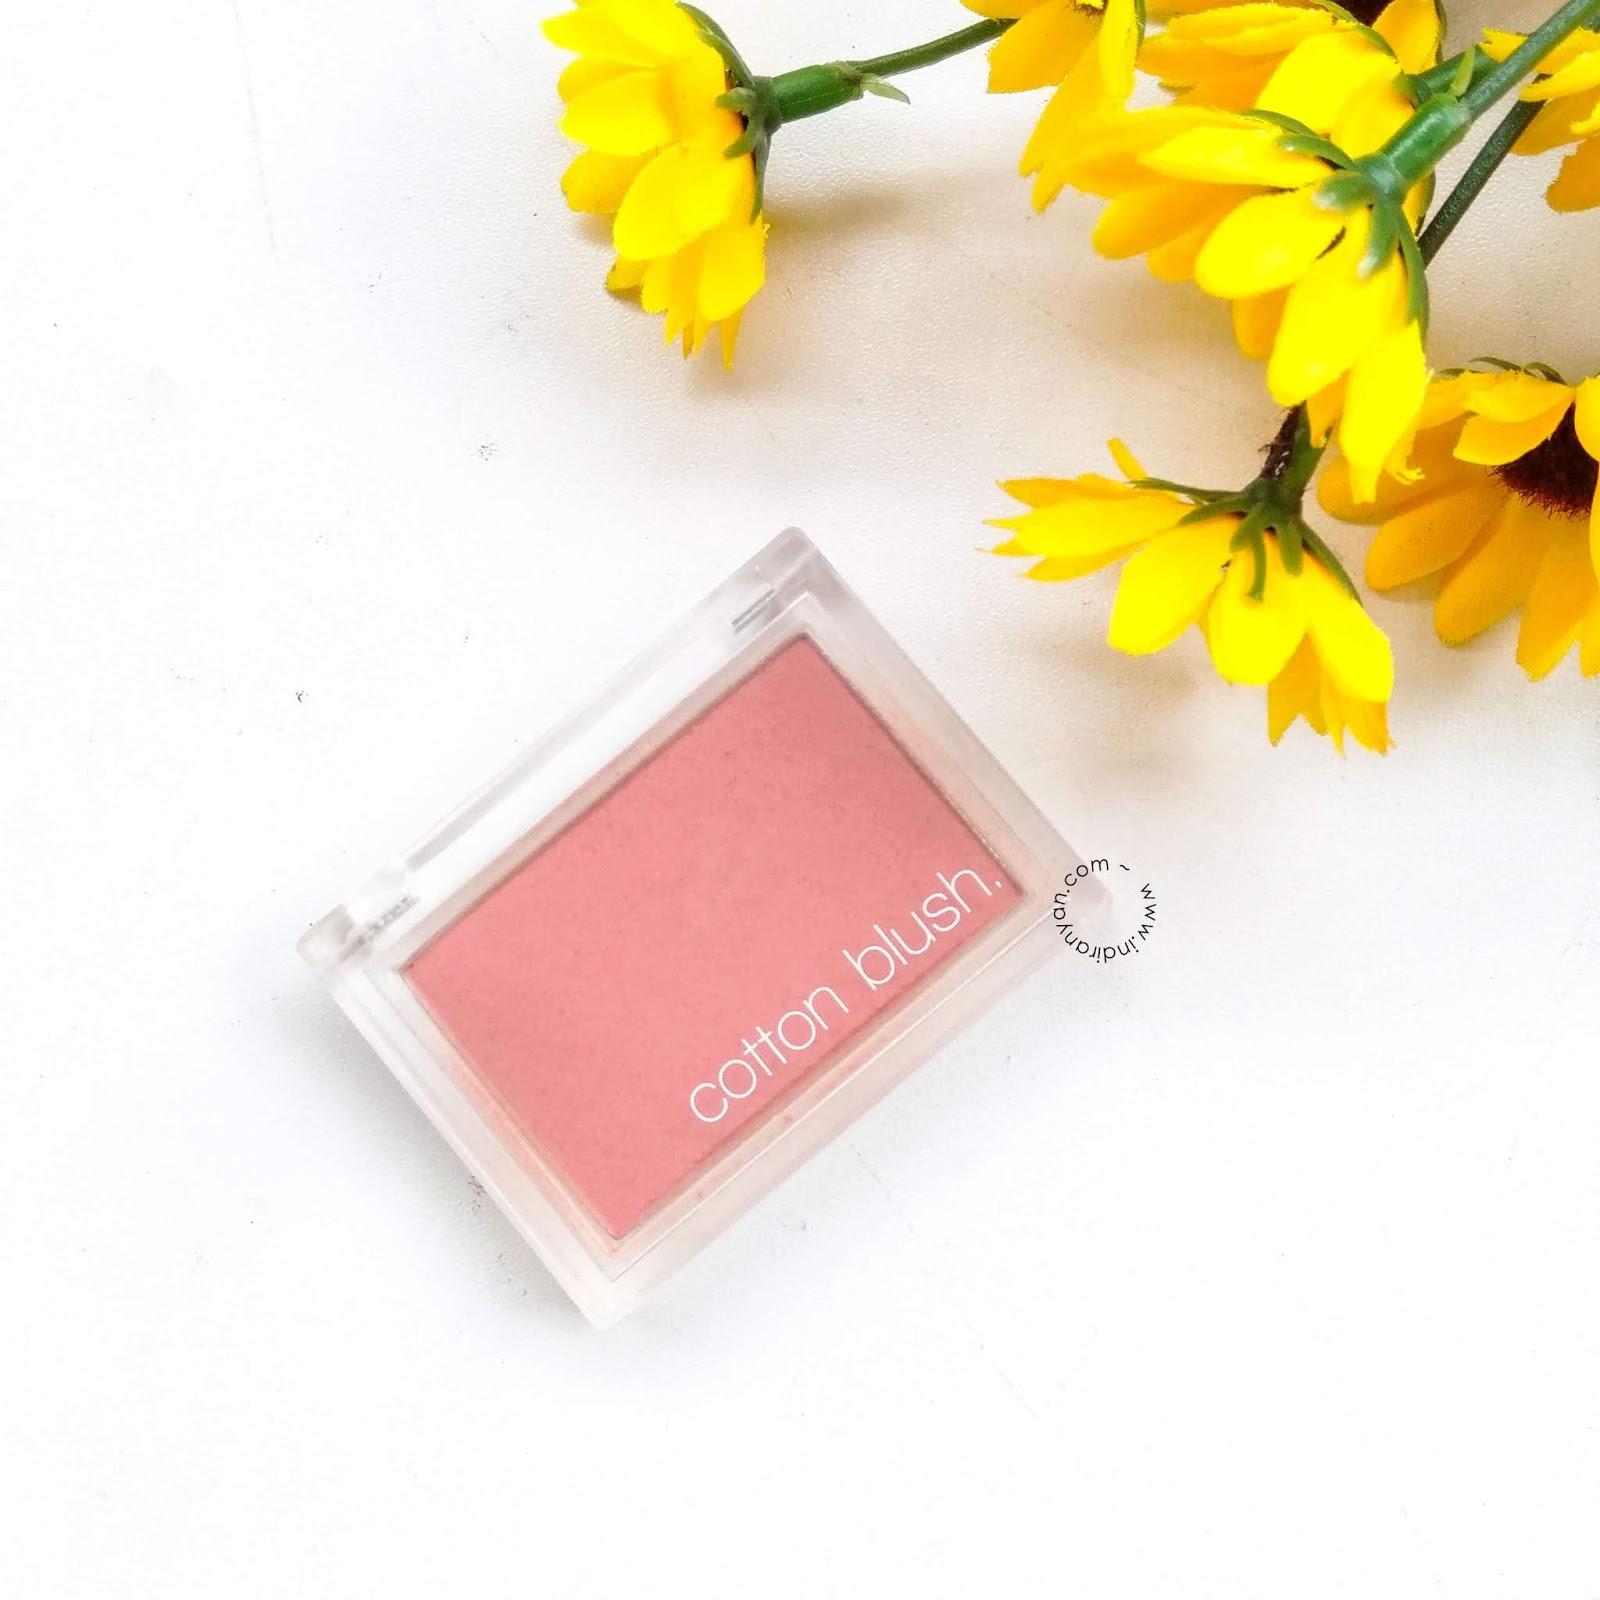 missha-cotton-blush-review